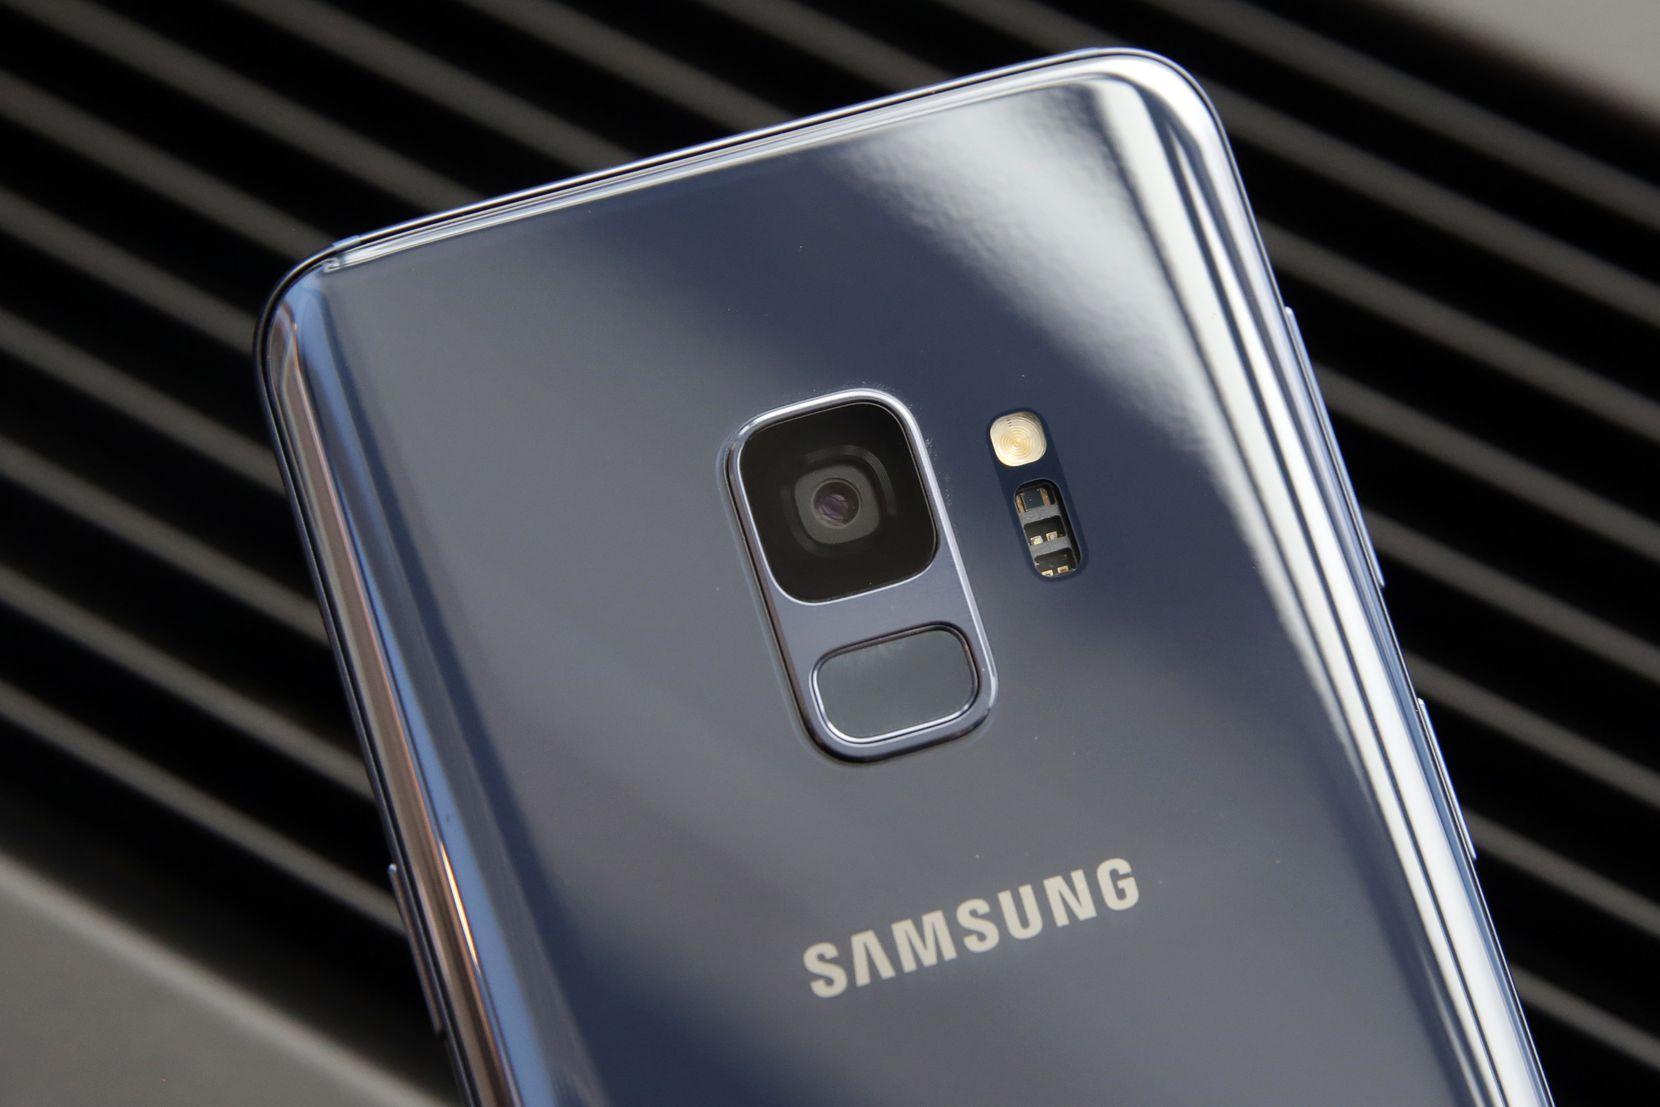 The Samsung Galaxy S9's fingerprint sensor  has moved below the camera lens.